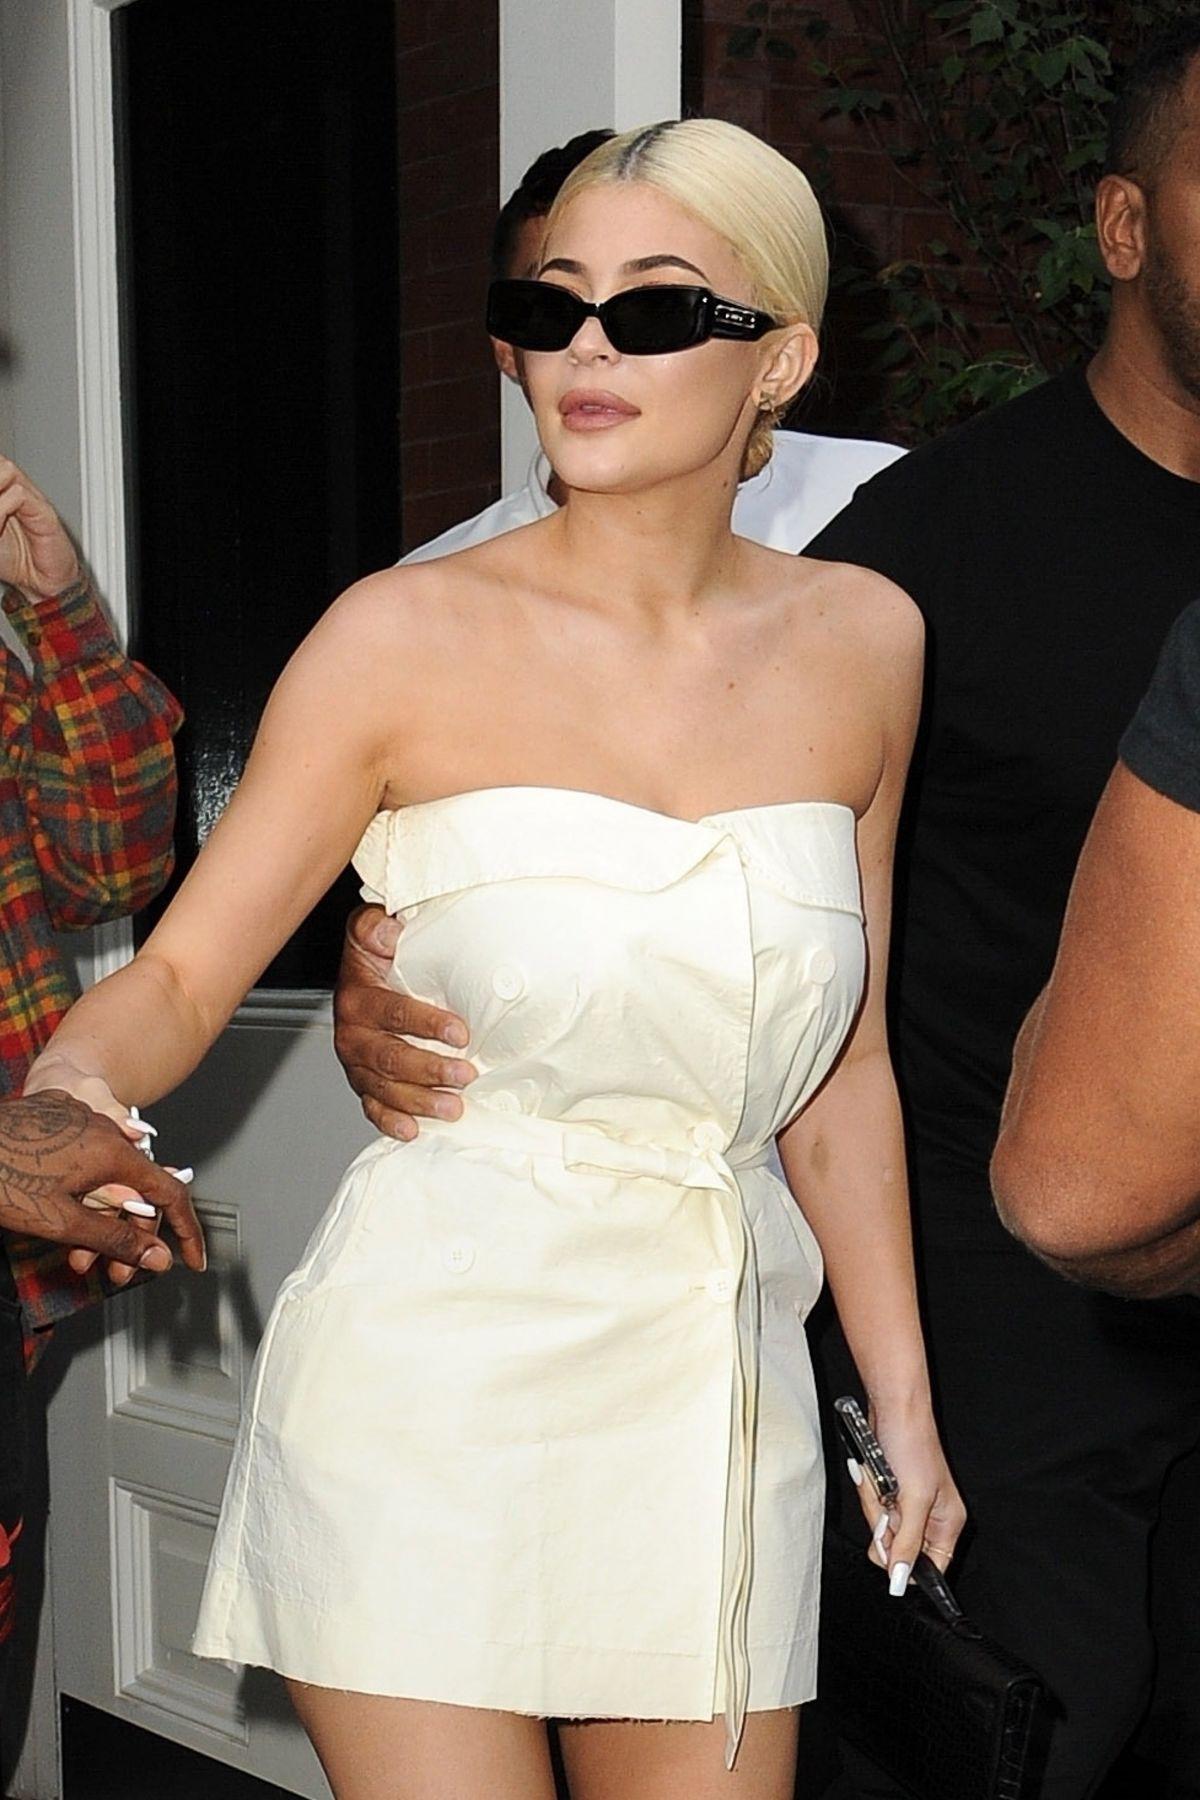 Watch Kylie jenner leaving the mercer hotel in manhattan video